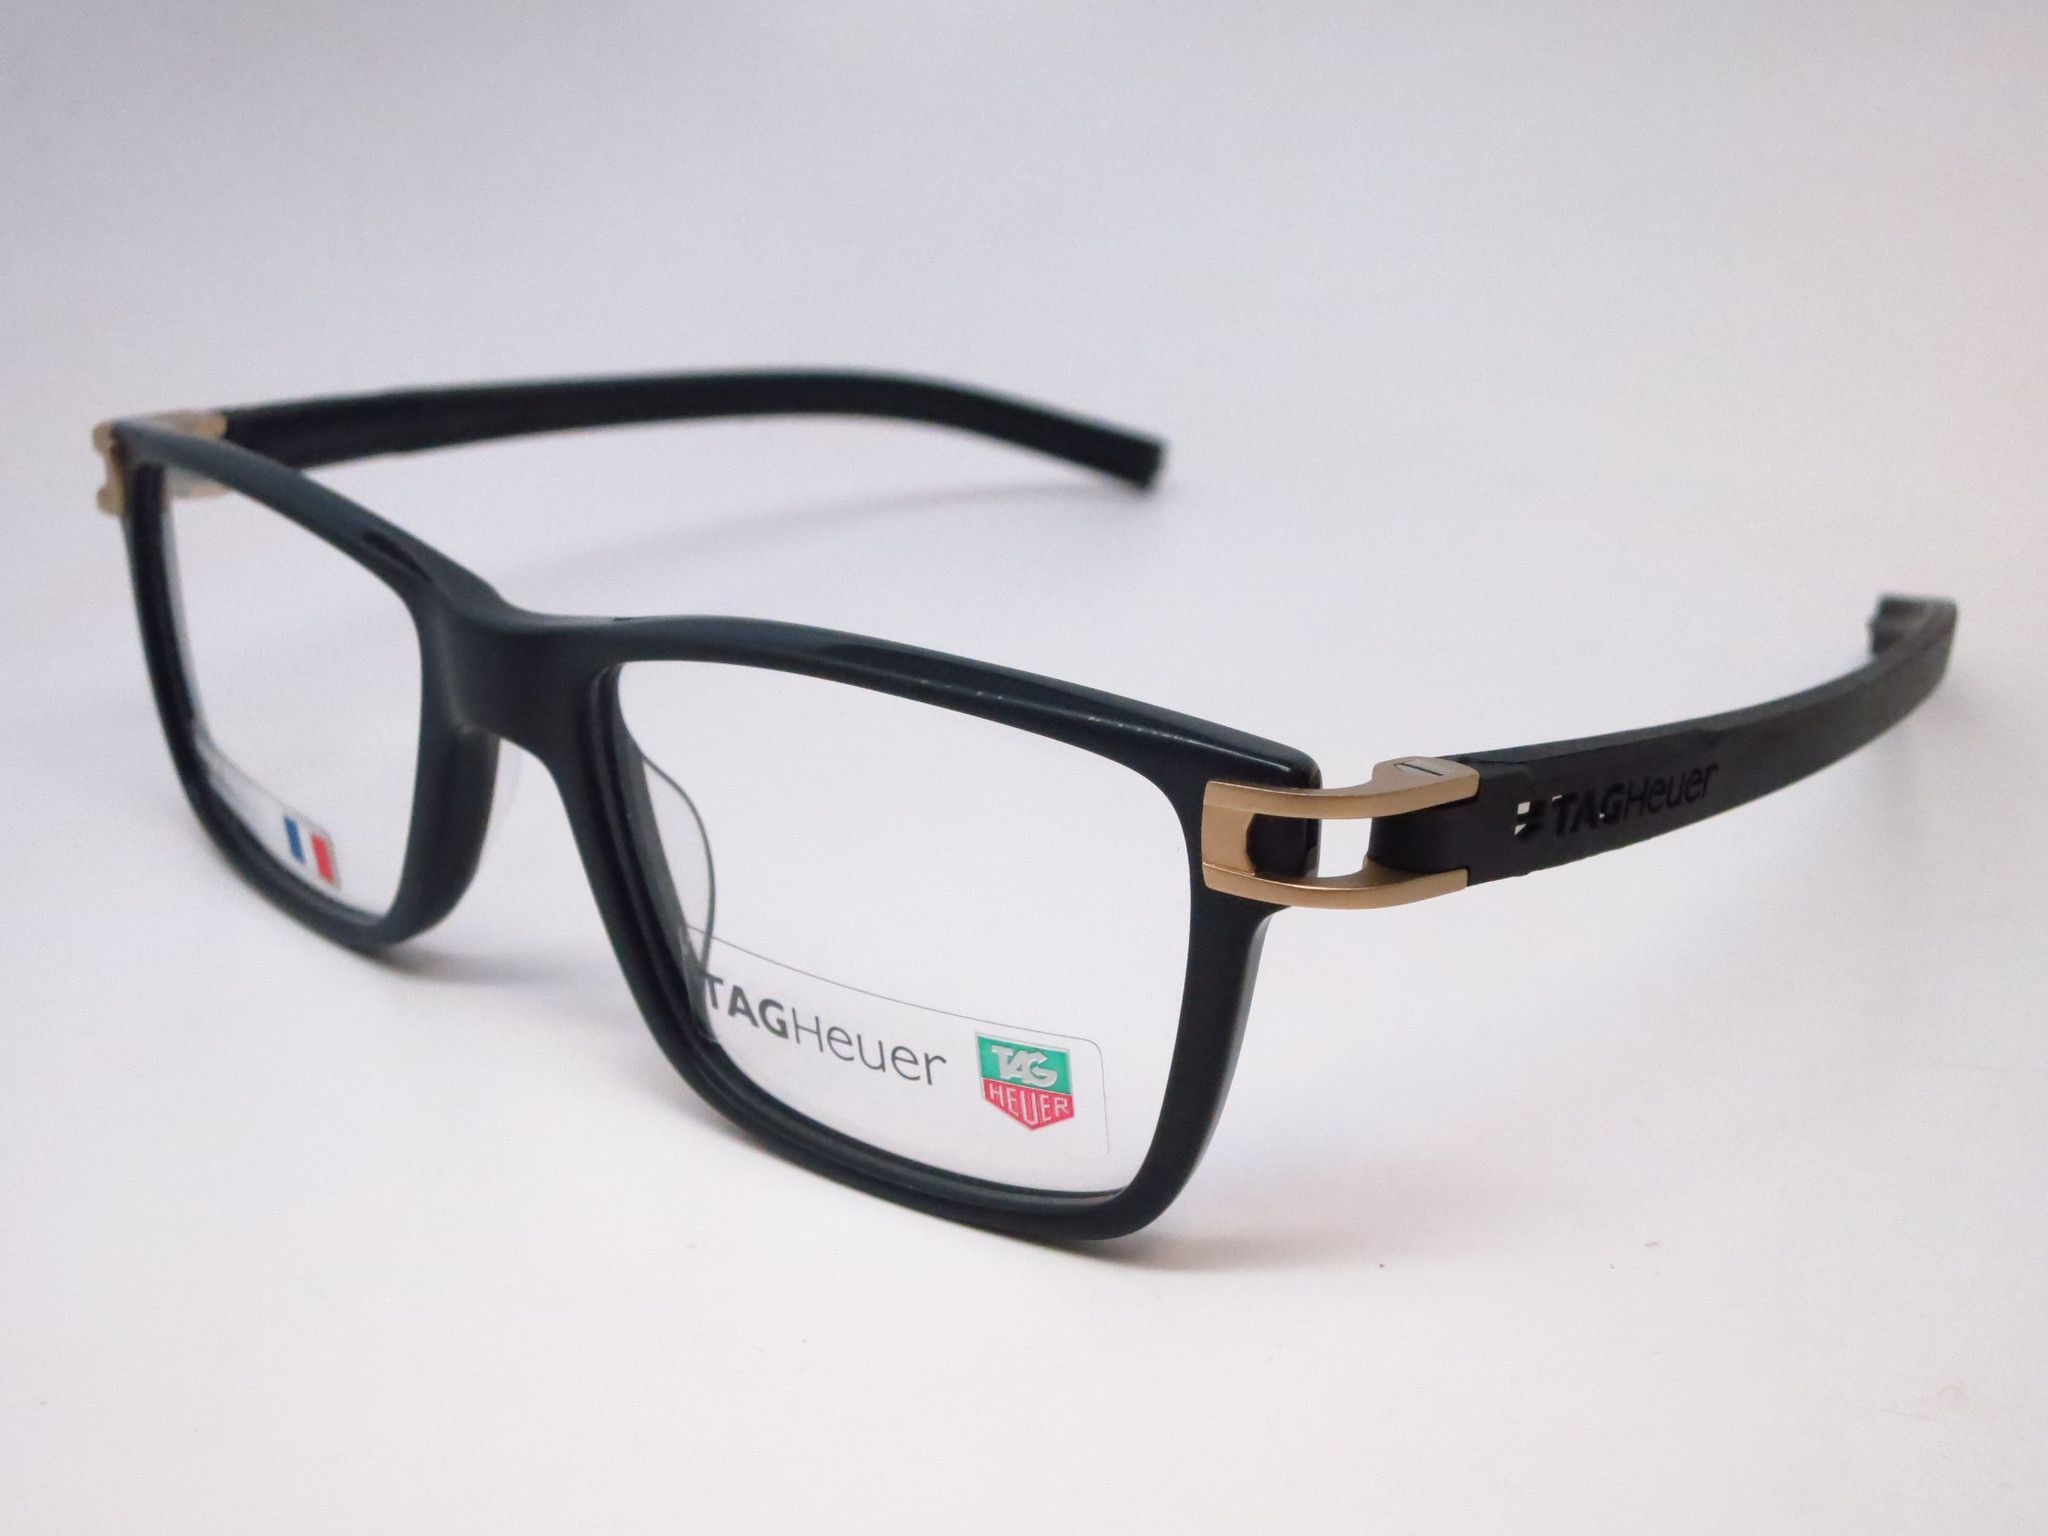 Tag heuer eyeglasses frames uk - Tag Heuer Th 7603 008 Black Track S Acetate Eyeglasses